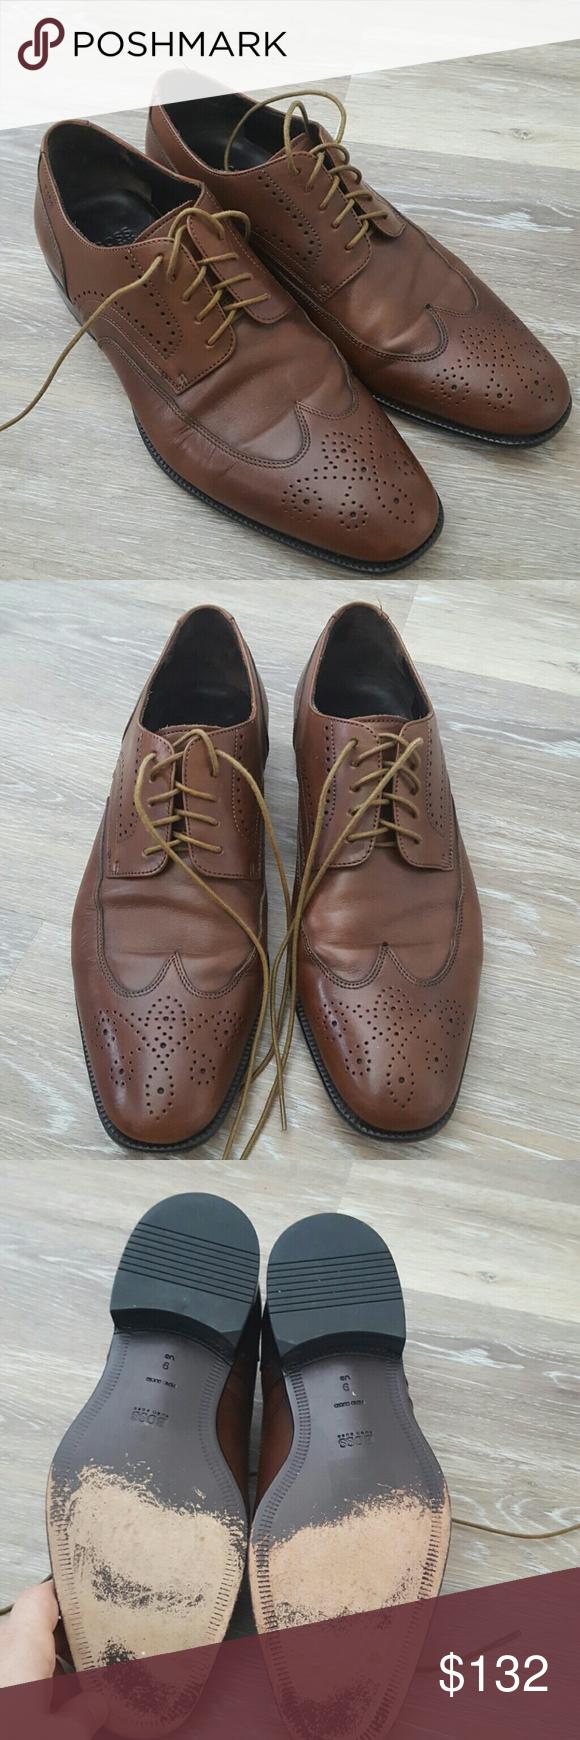 e28a4222e0d Authentic Hugo Boss vero cuoio shoes In very good condition. No trades Hugo  Boss Shoes Oxfords   Derbys